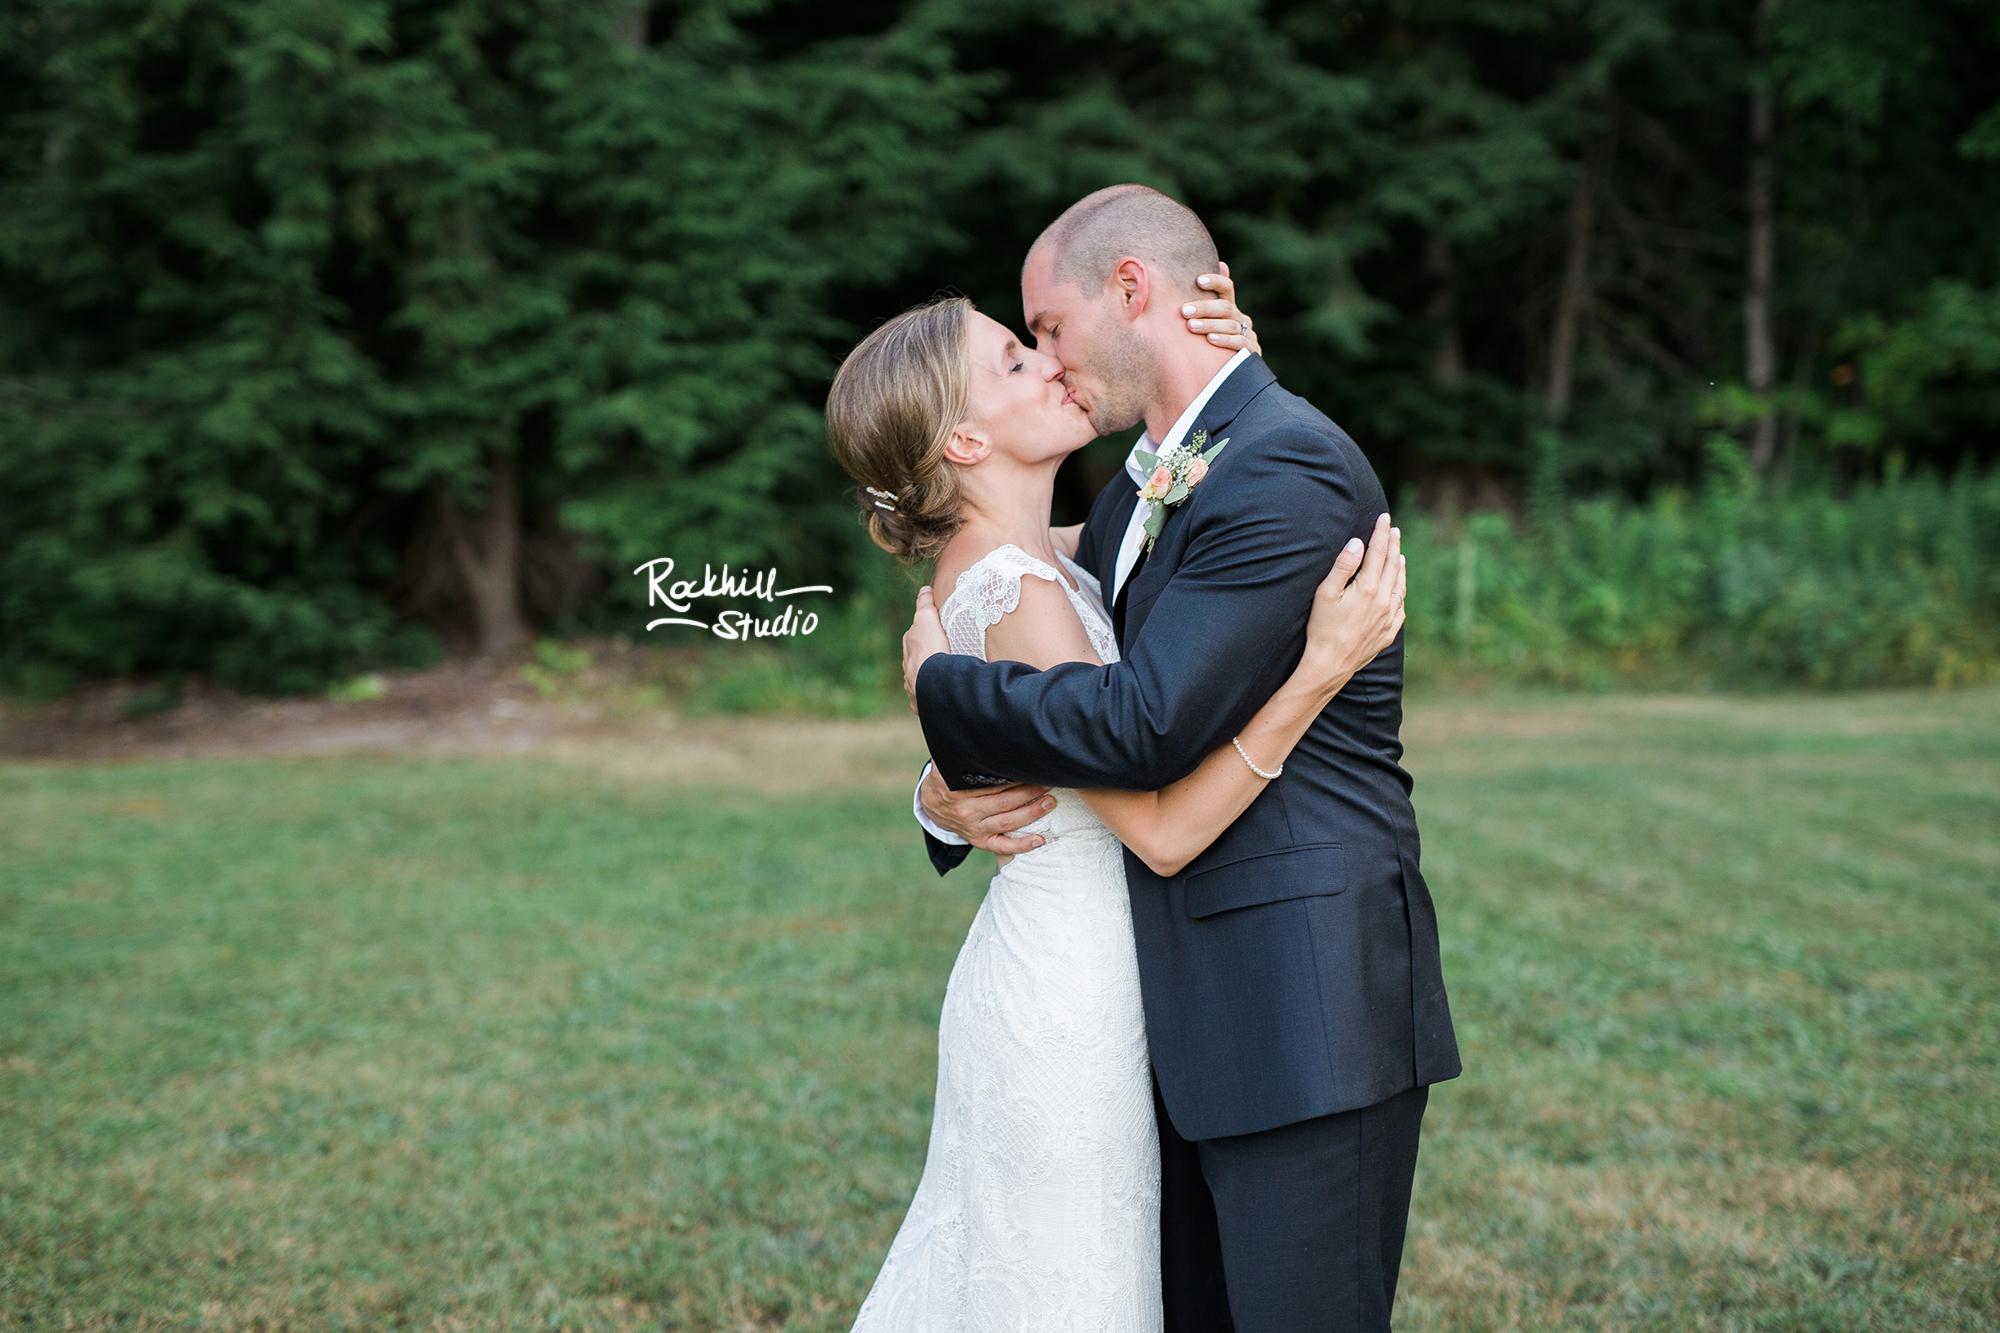 grand-marais-wedding-photography-upper-peninsula-northern-michigan-rockhill-95.jpg